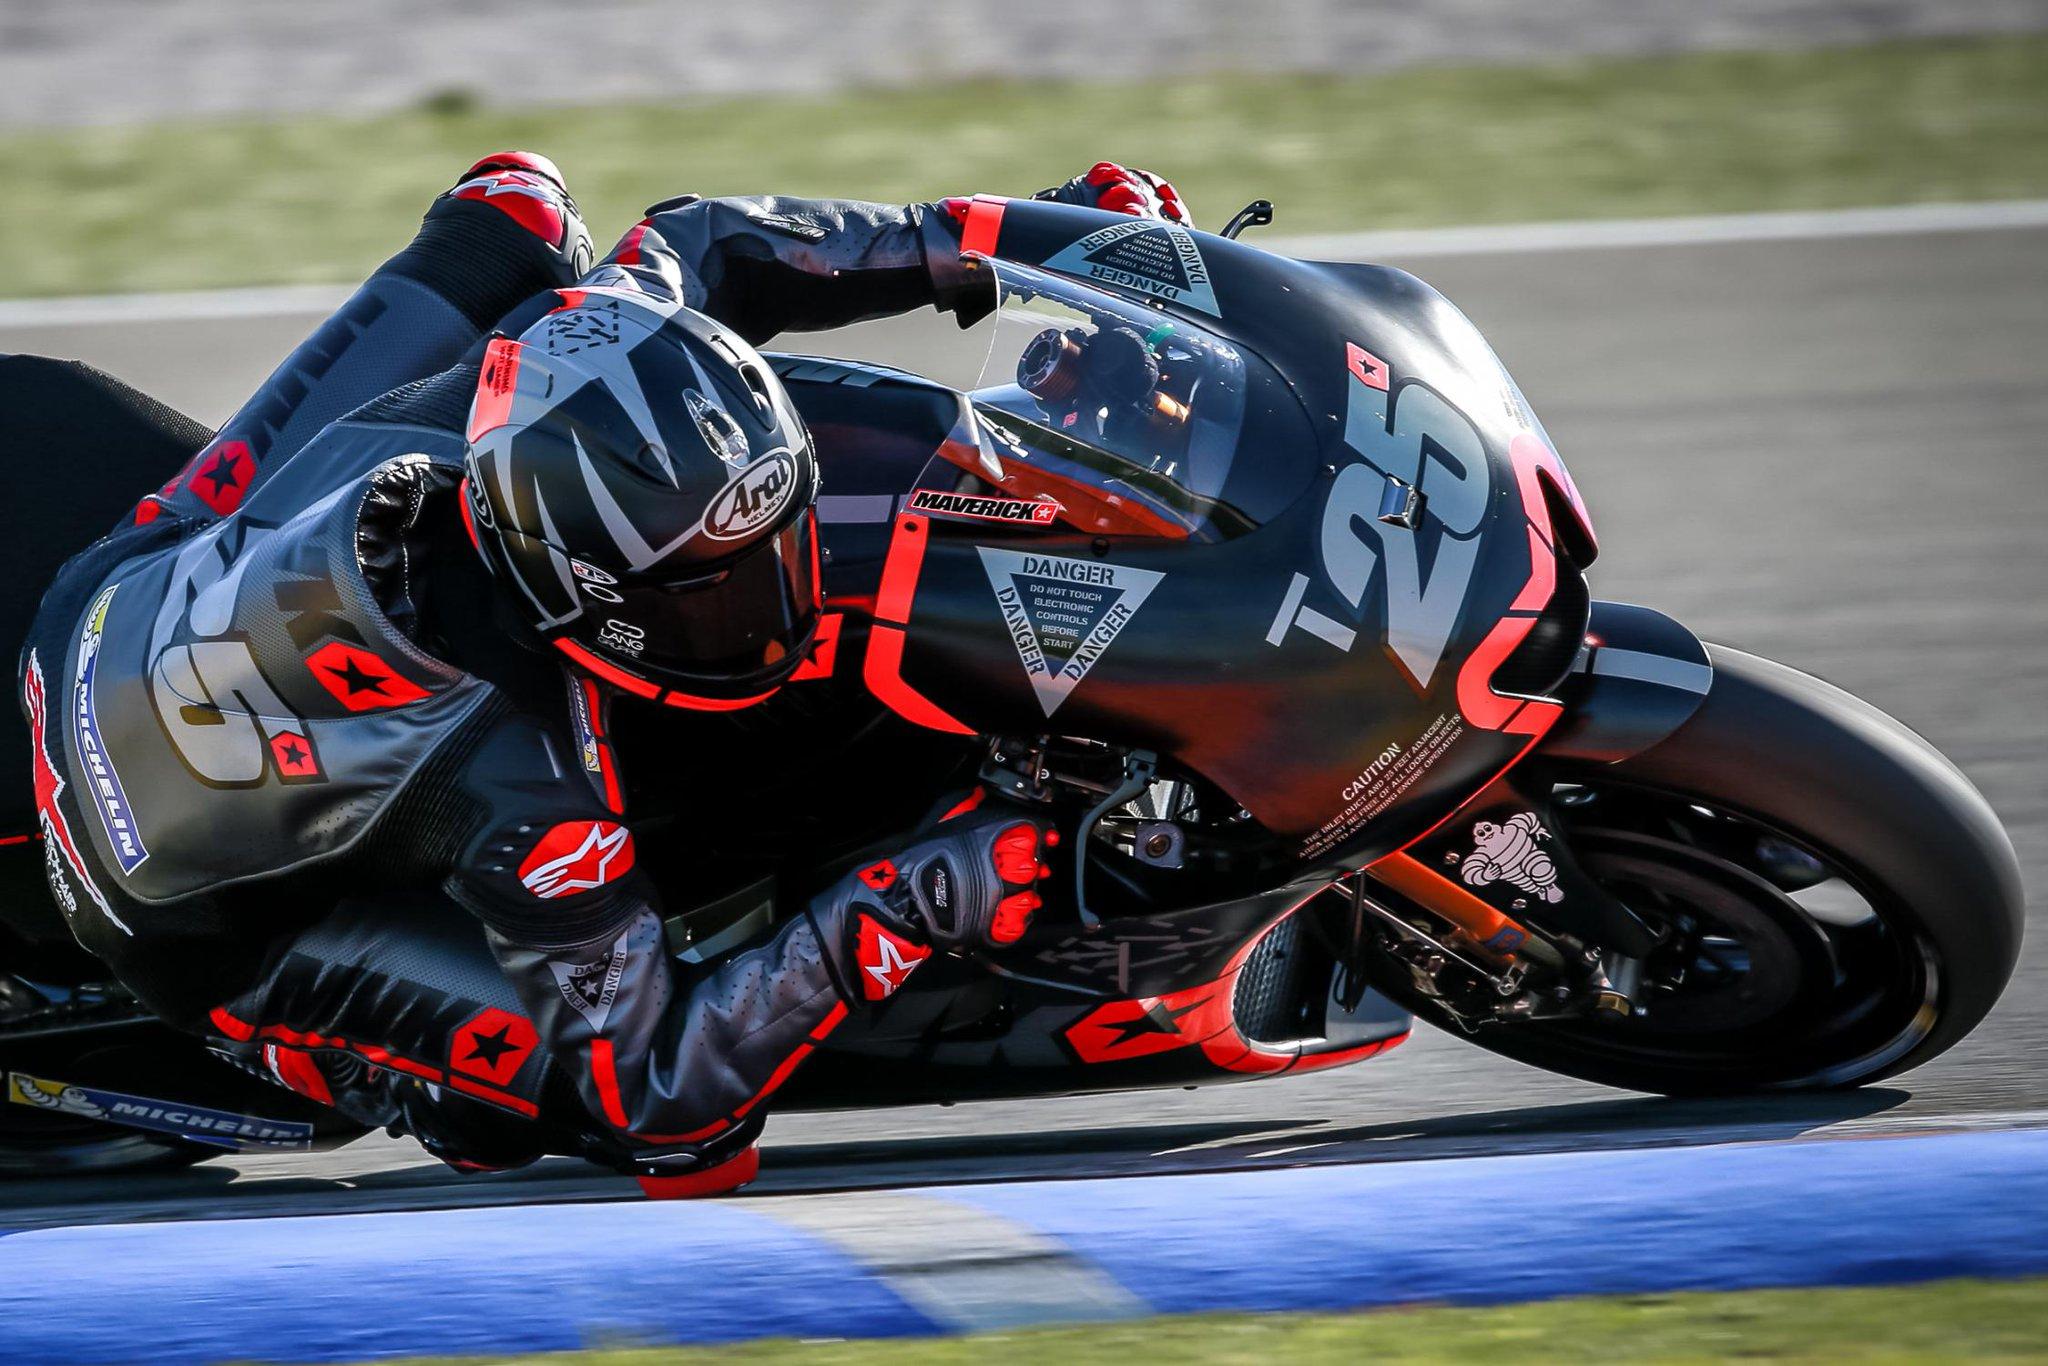 MotoGP Valencia Test Day 1 Result: Vinales, Rossi, Lorenzo